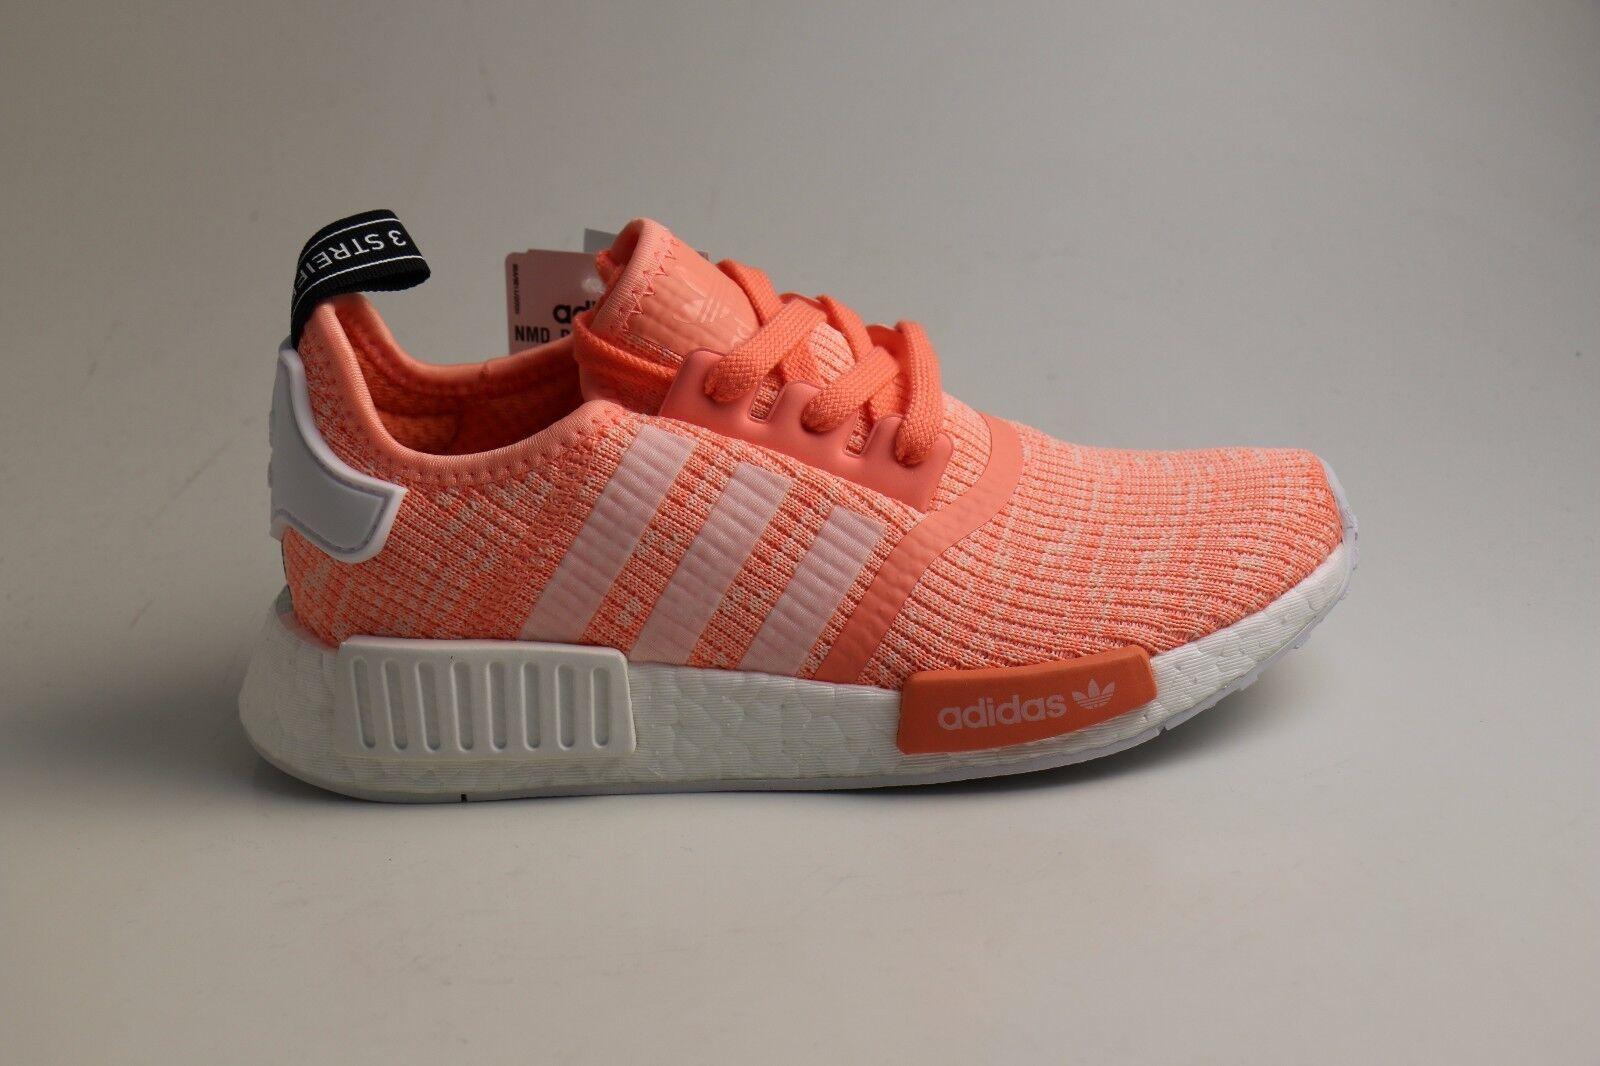 38 3 2 36 EUR Apricot Orange Glow Sun R1 NMD Wmns Adidas 39